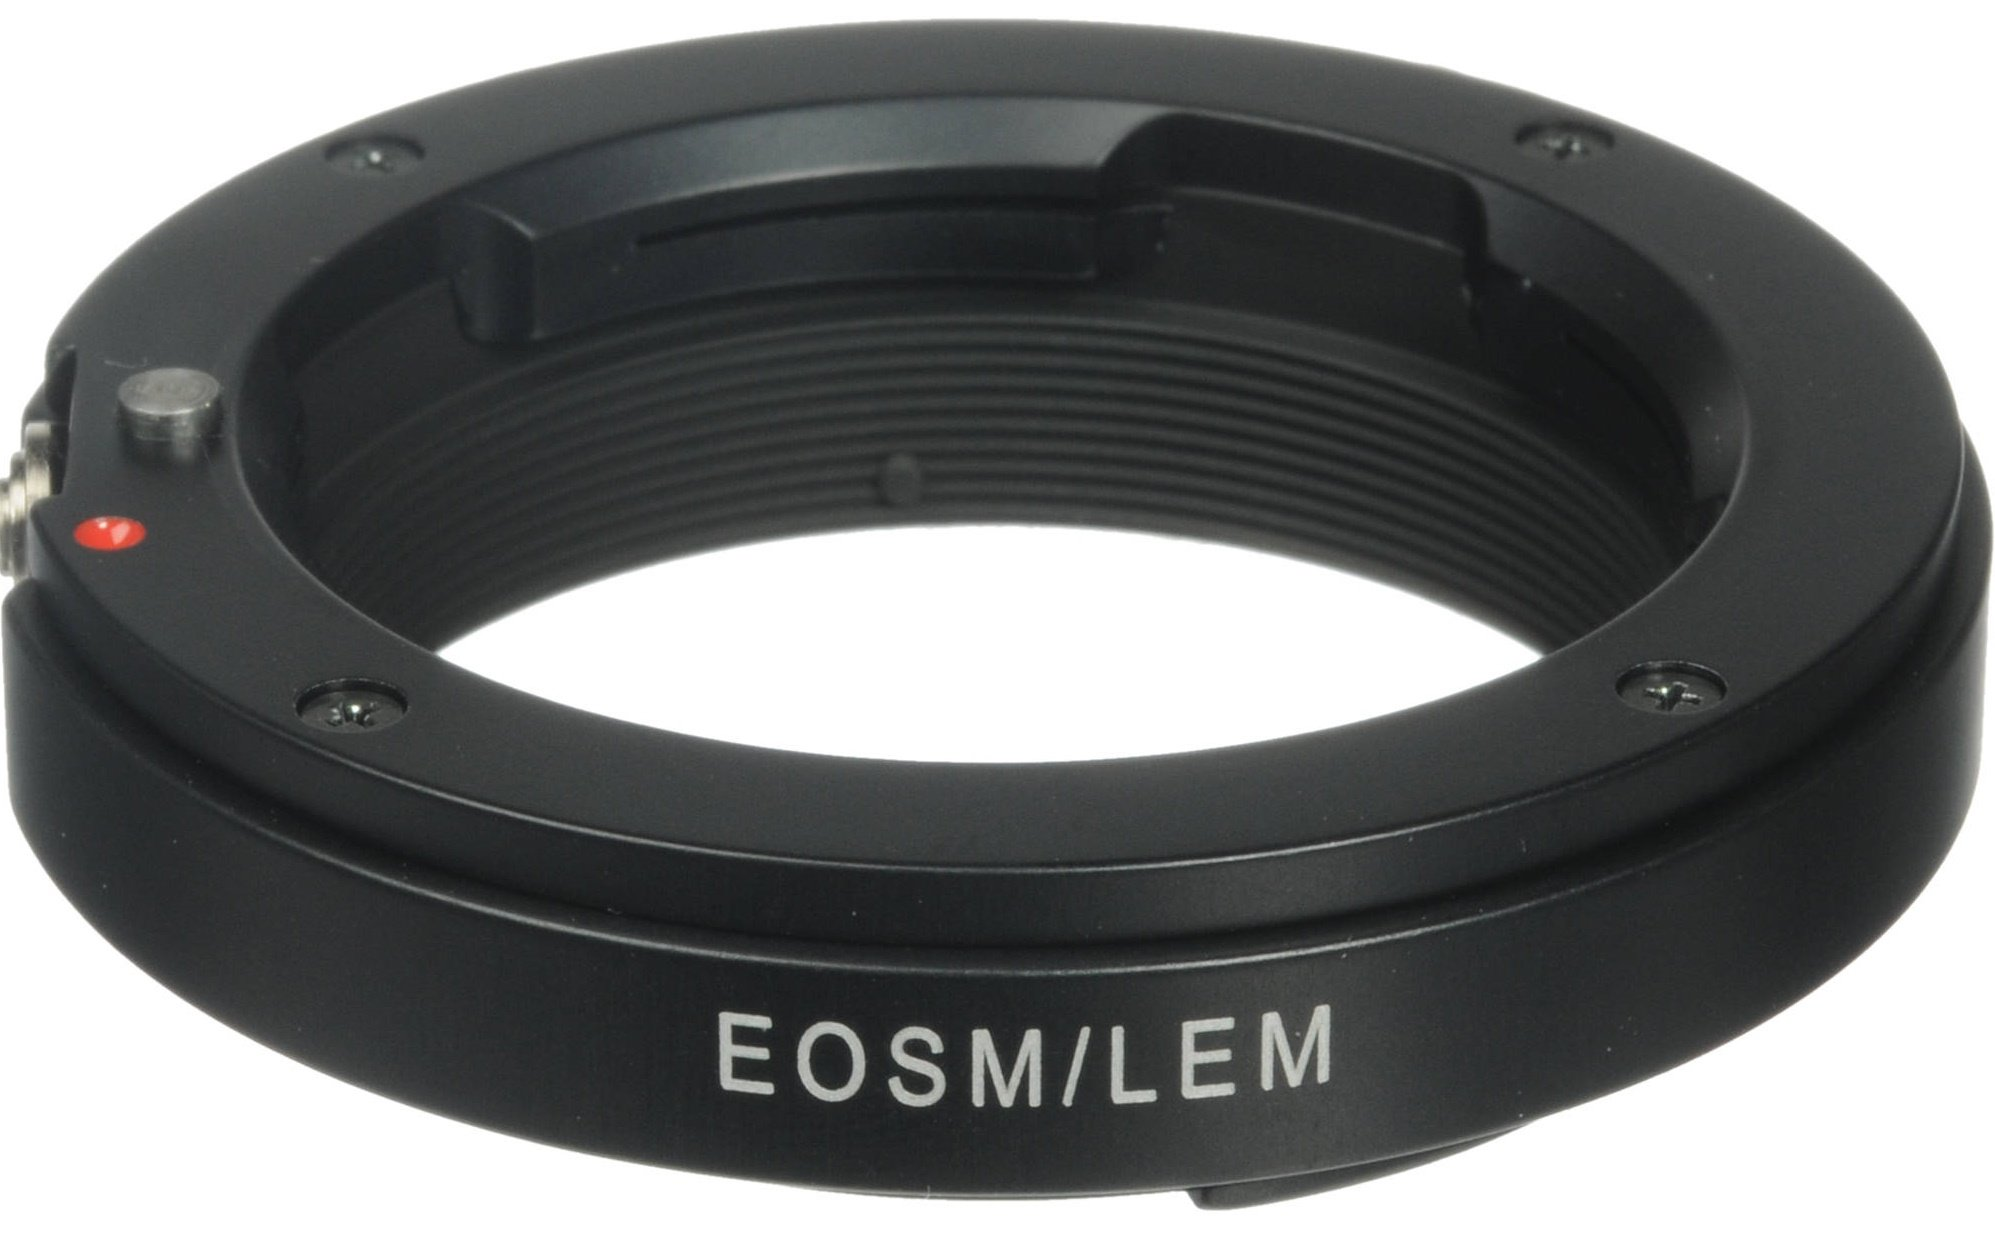 NOVOFLEX Adaptér EOSM/LEM objektiv Leica M na tělo Canon EOS M